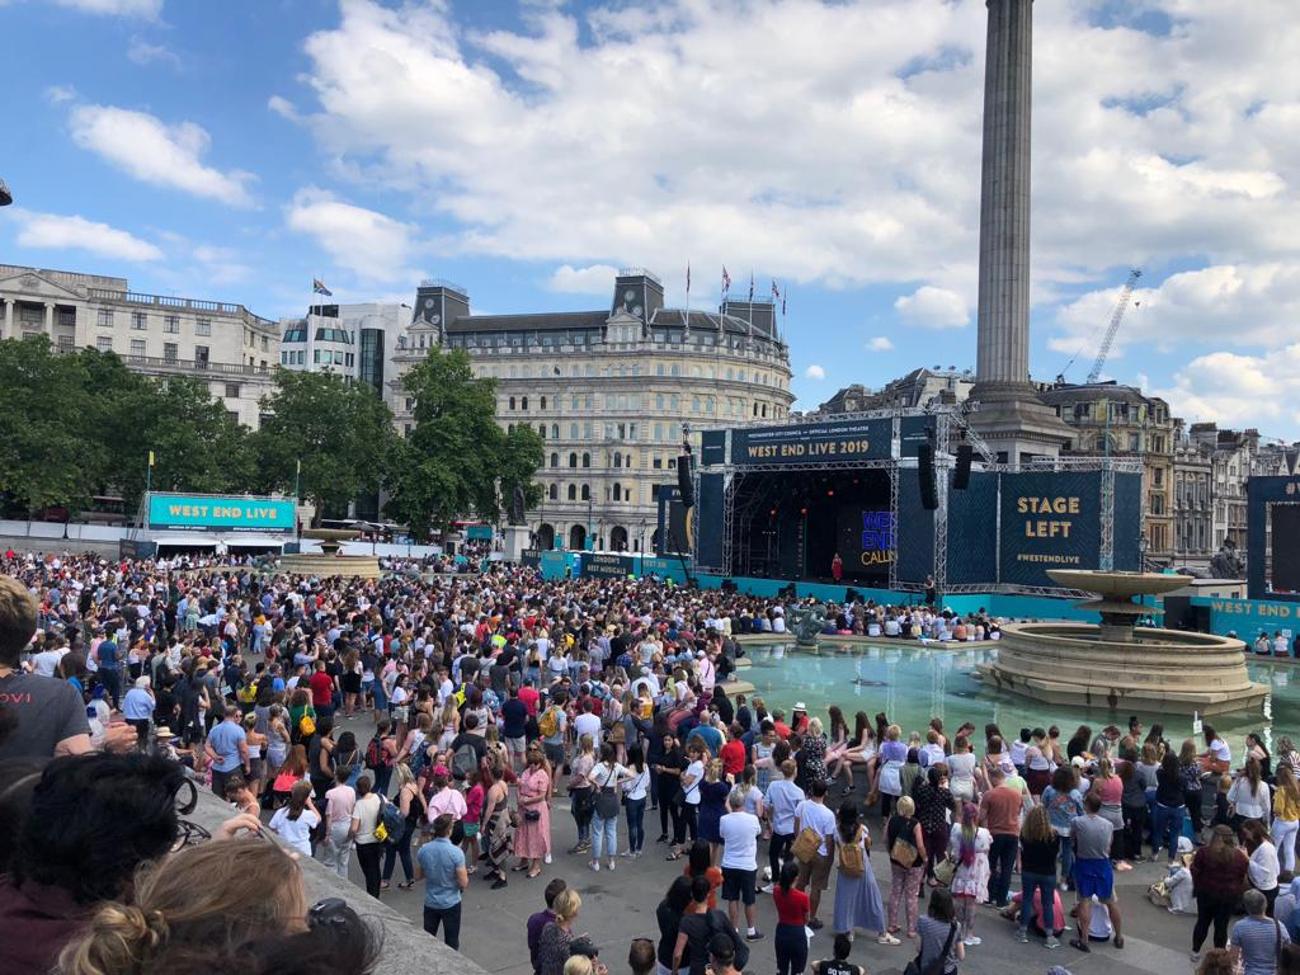 BWW Review: WEST END LIVE, Trafalgar Square